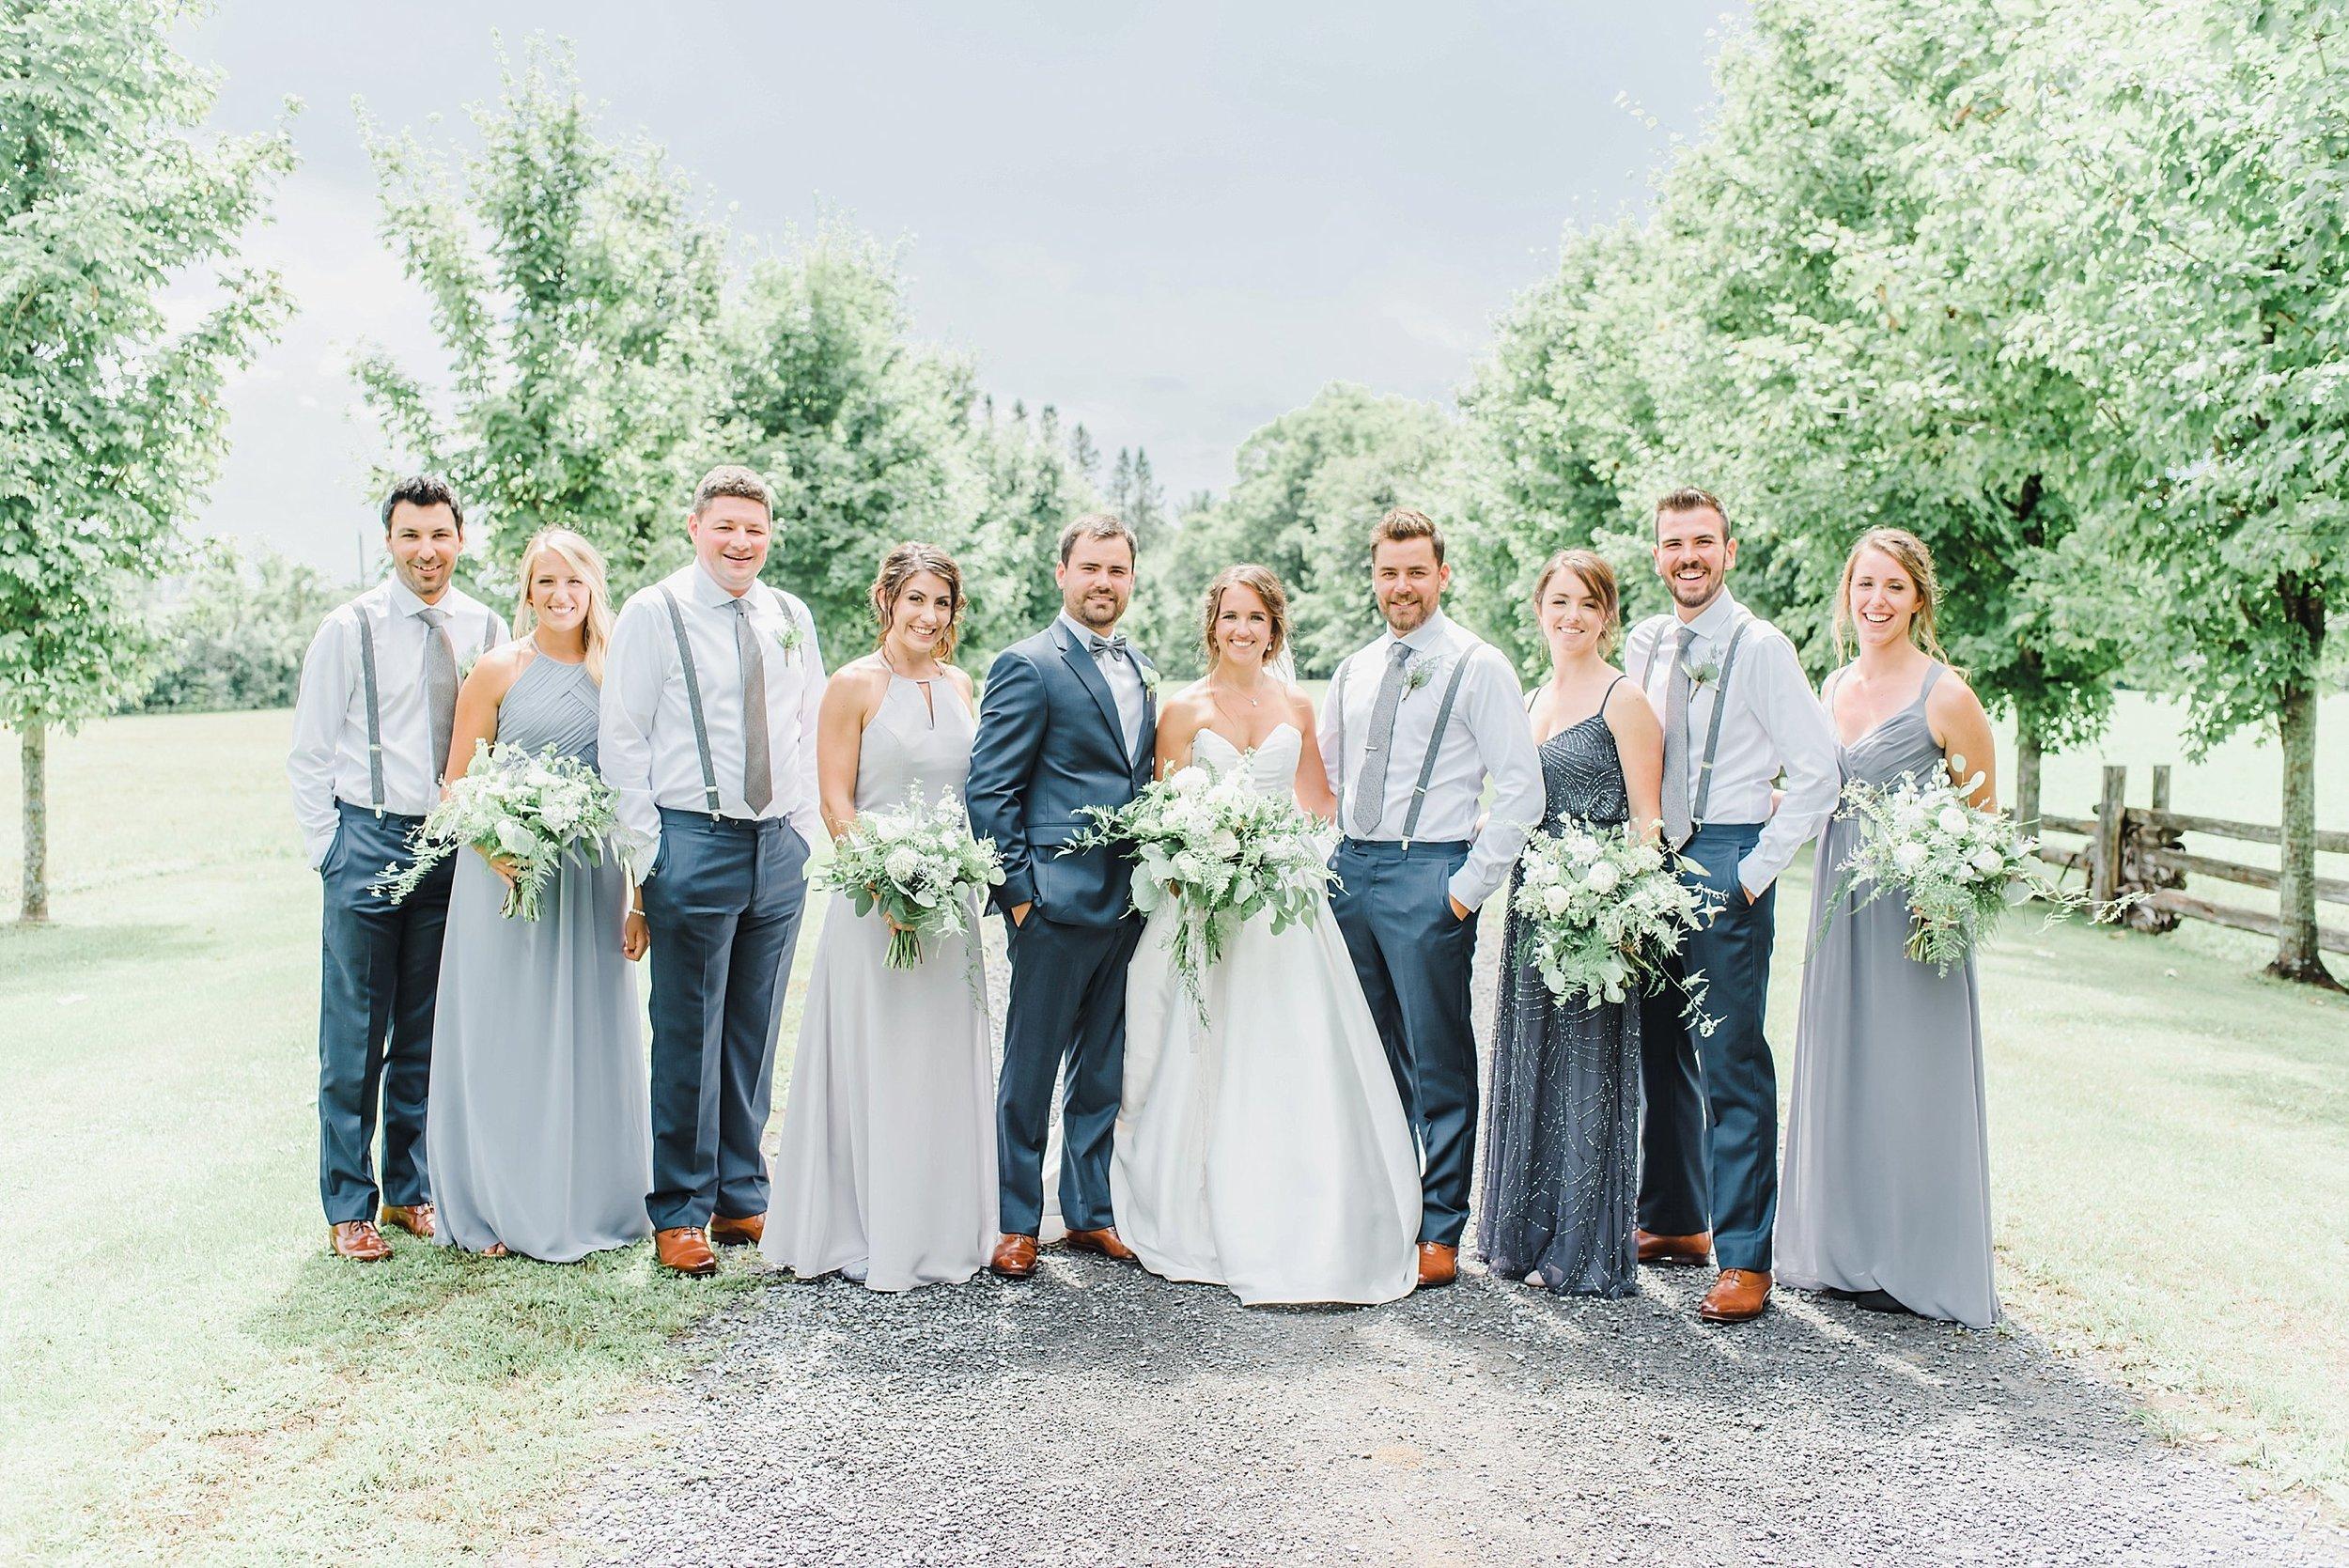 light airy indie fine art ottawa wedding photographer | Ali and Batoul Photography_0603.jpg